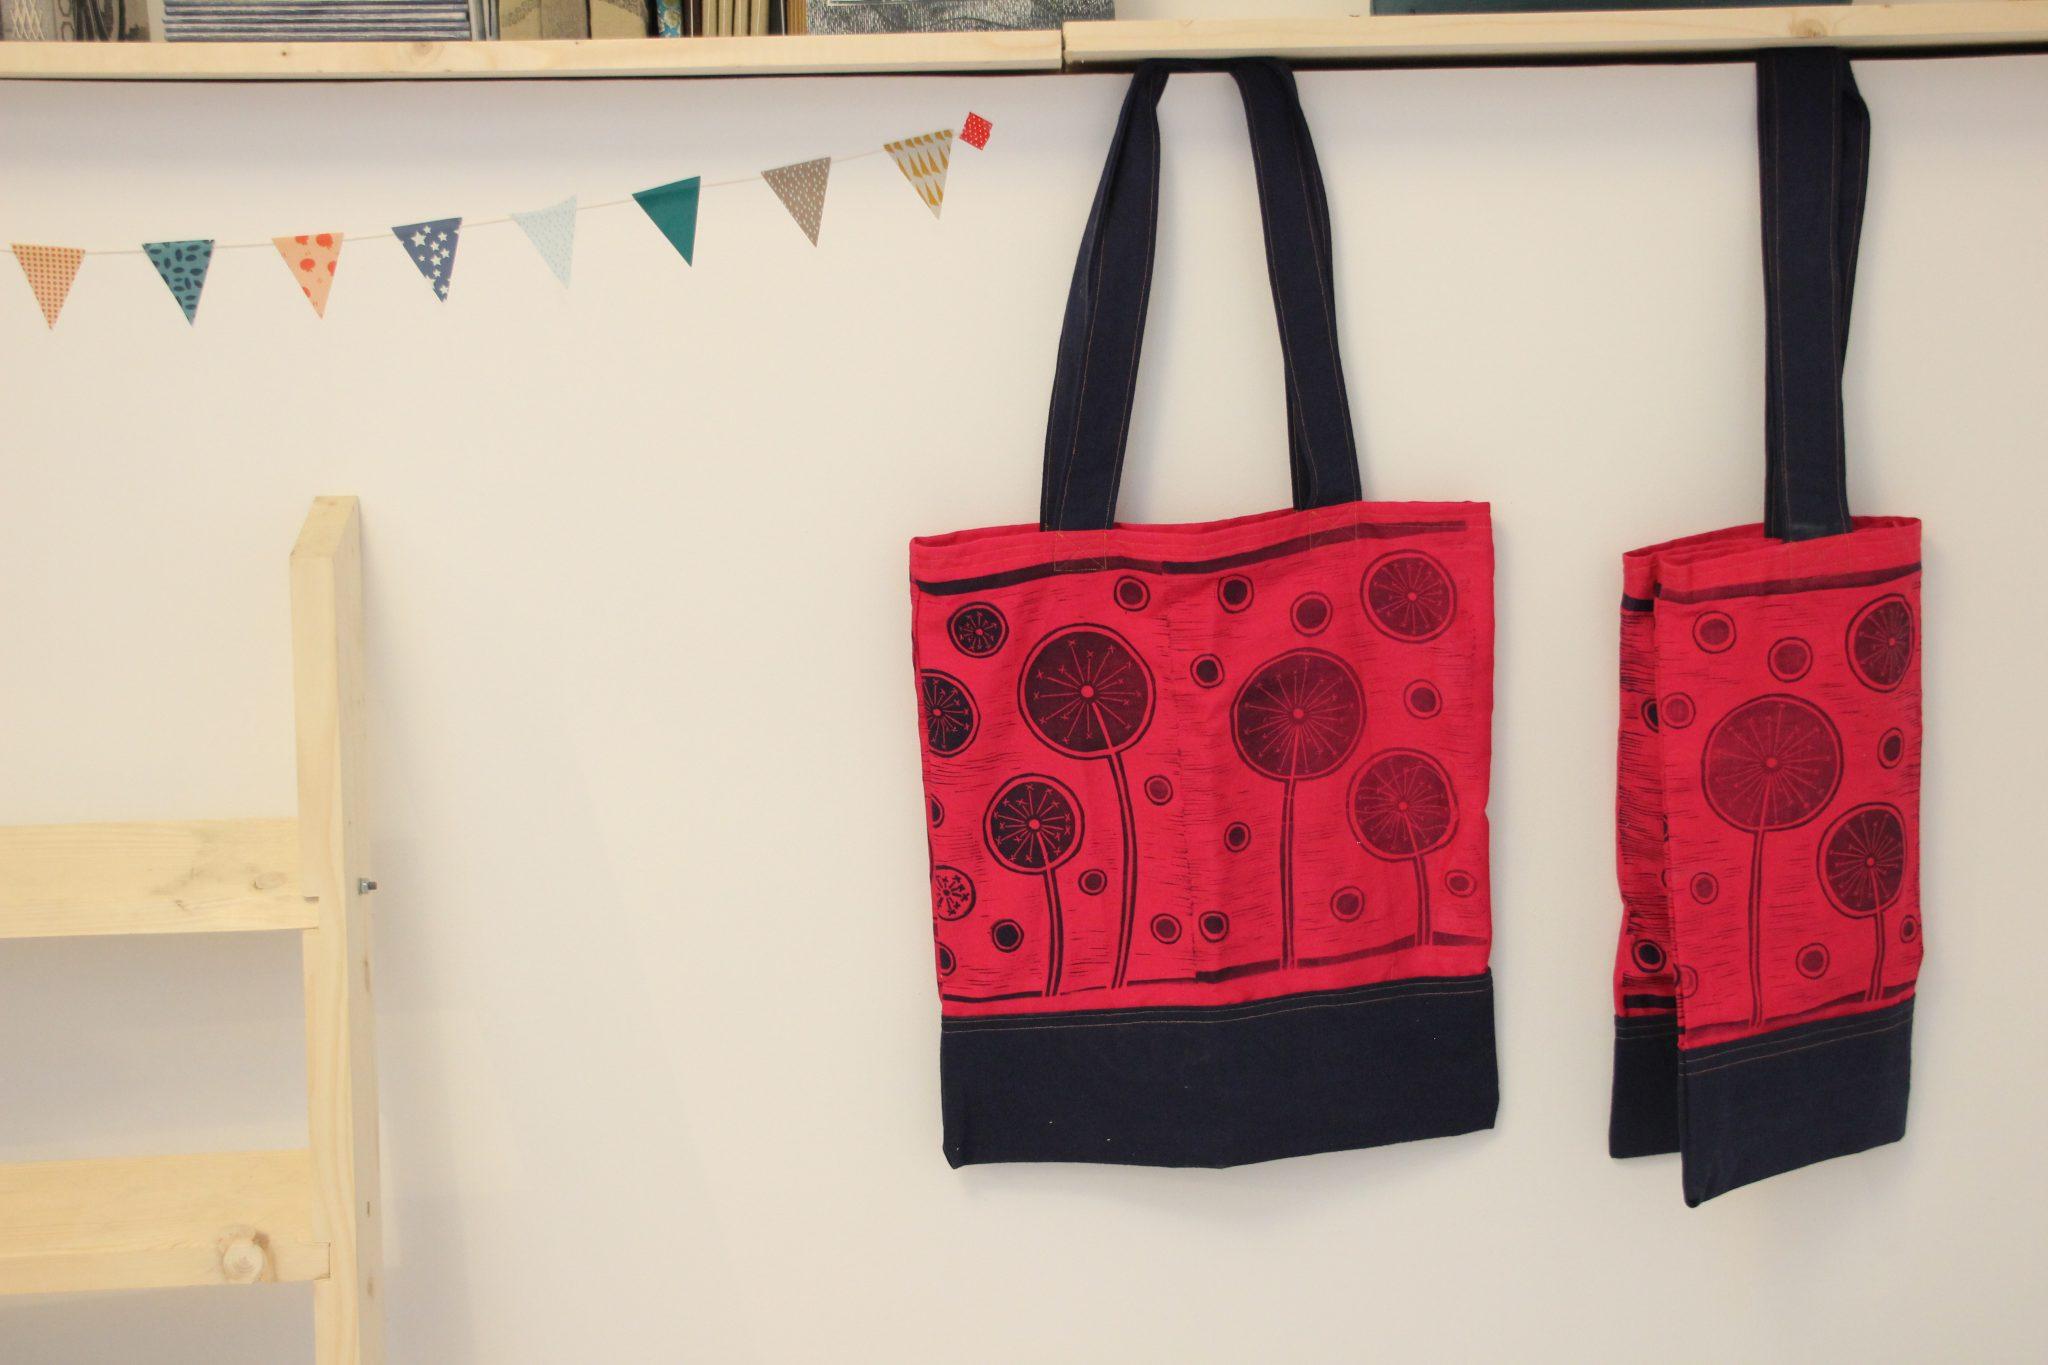 sacs | atelier | LinoLino | Linogravure | Créations artisanales